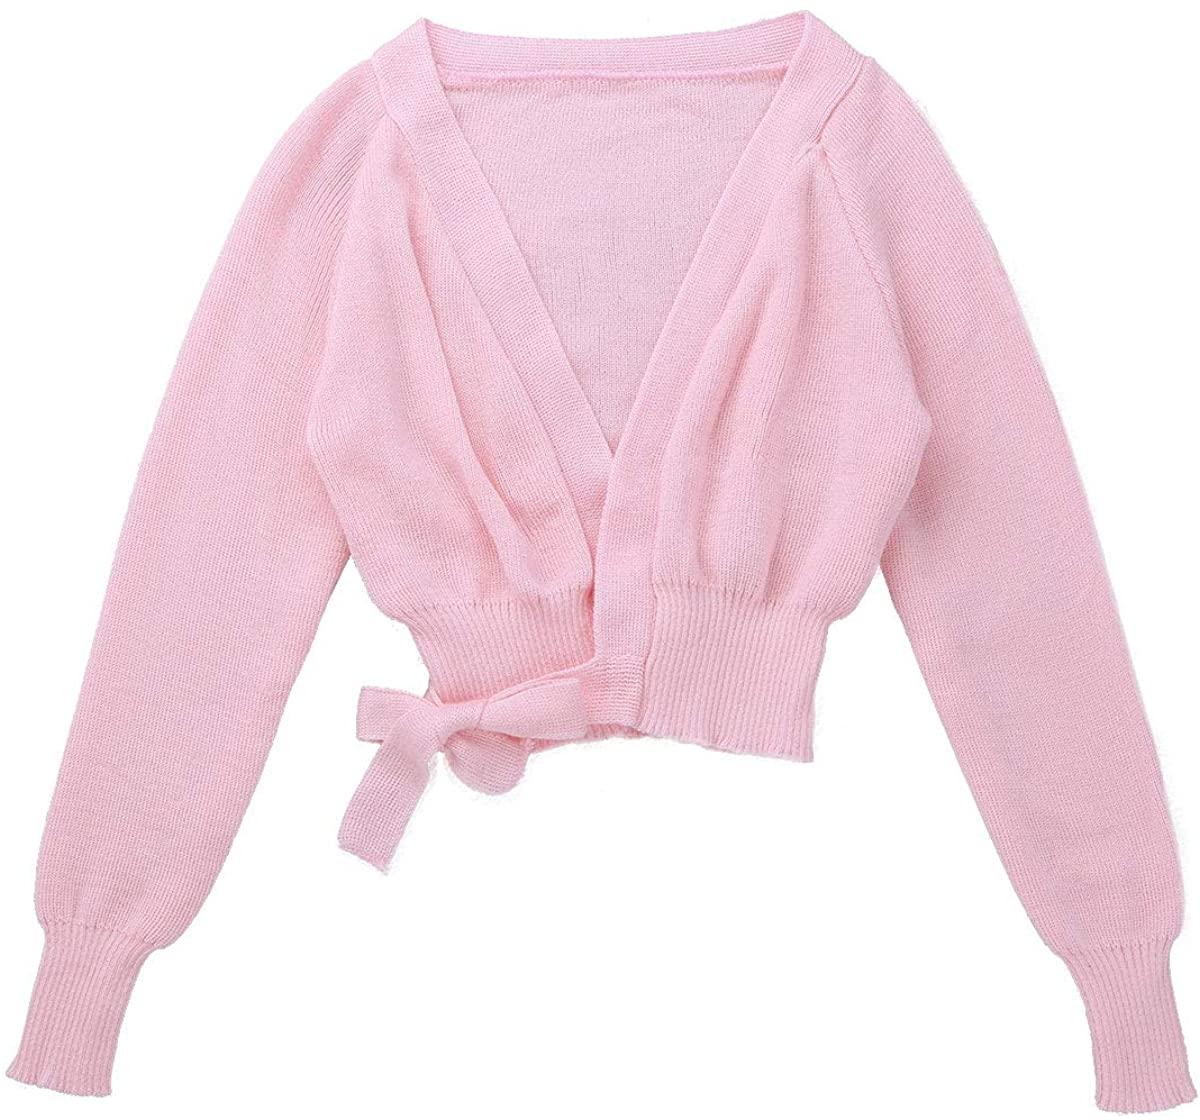 renvena Kids Girls Classic Basic Ballet Dance Gymnastic Active Cardigan Long Sleeve Knit Wrap Warm-up Sweater